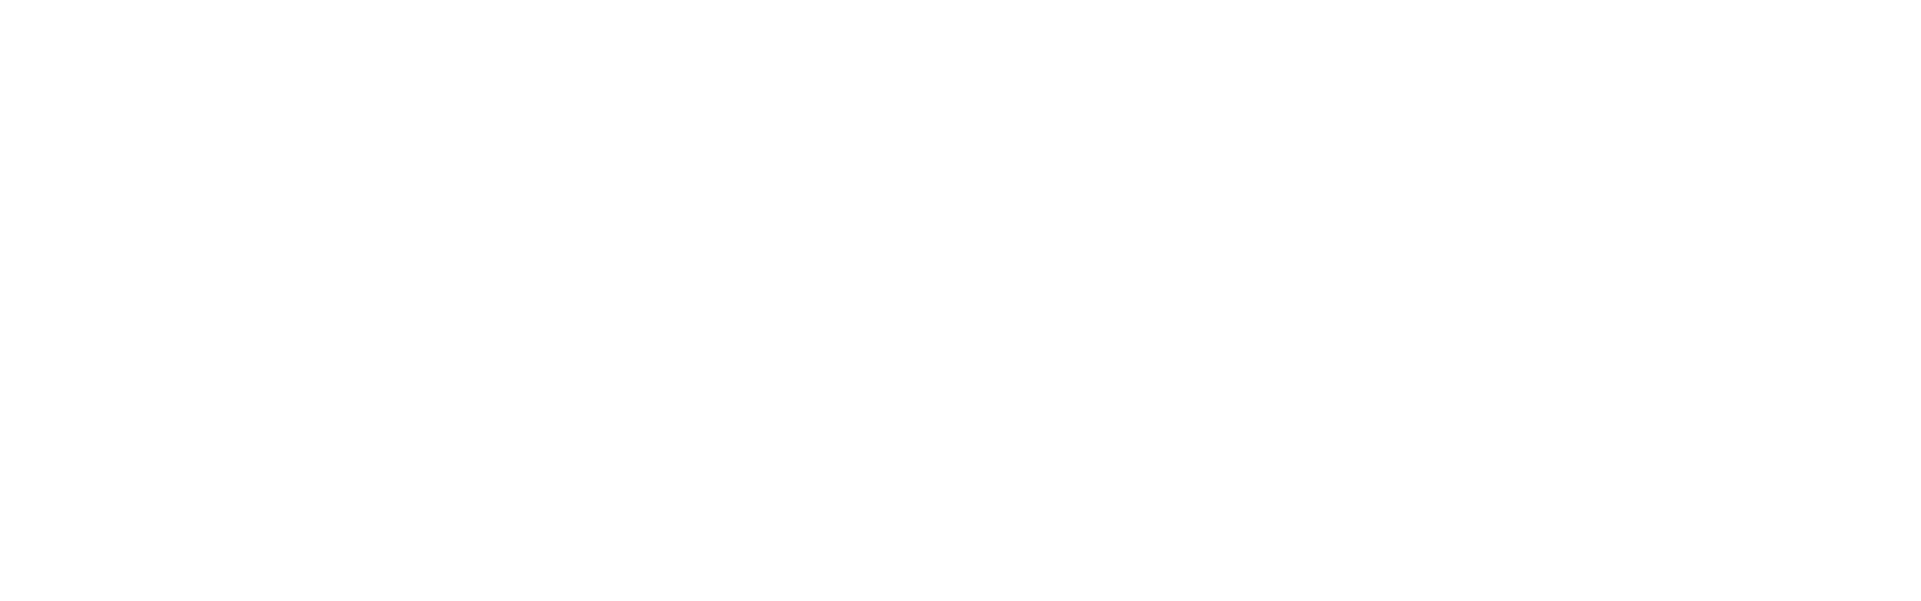 Ramones Project